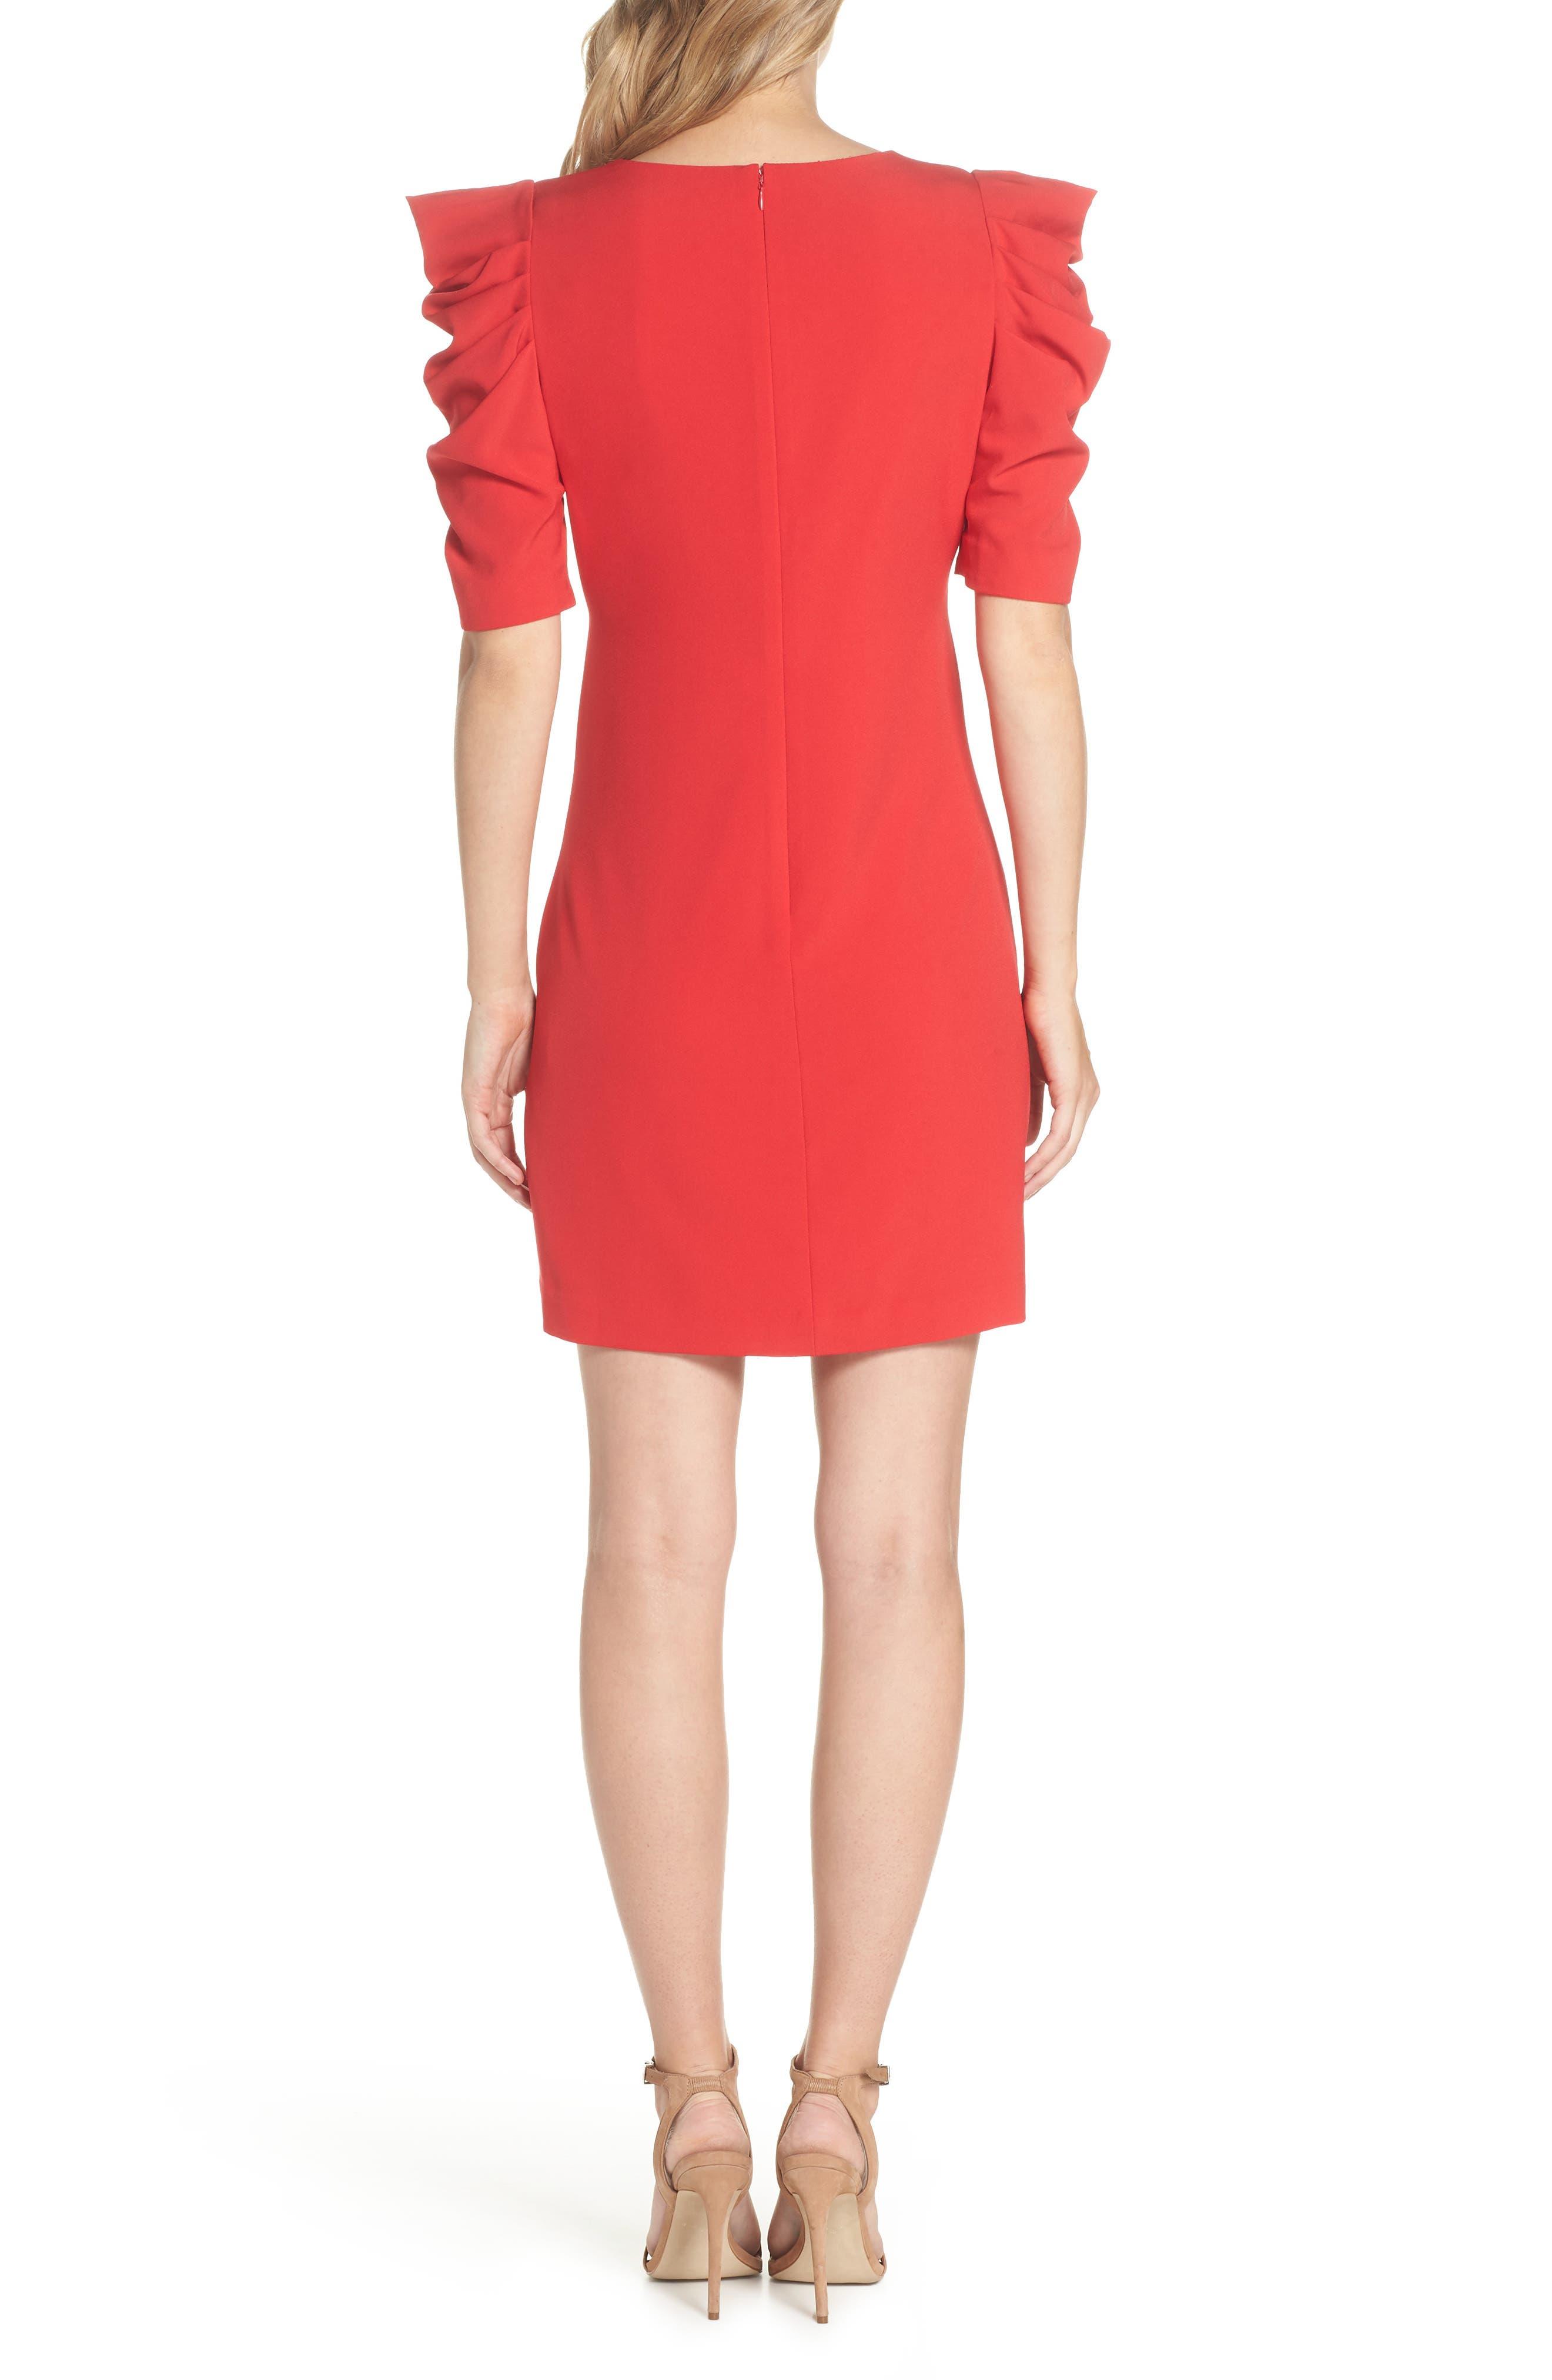 Puff Sleeve Shift Dress,                             Alternate thumbnail 2, color,                             Red Festive